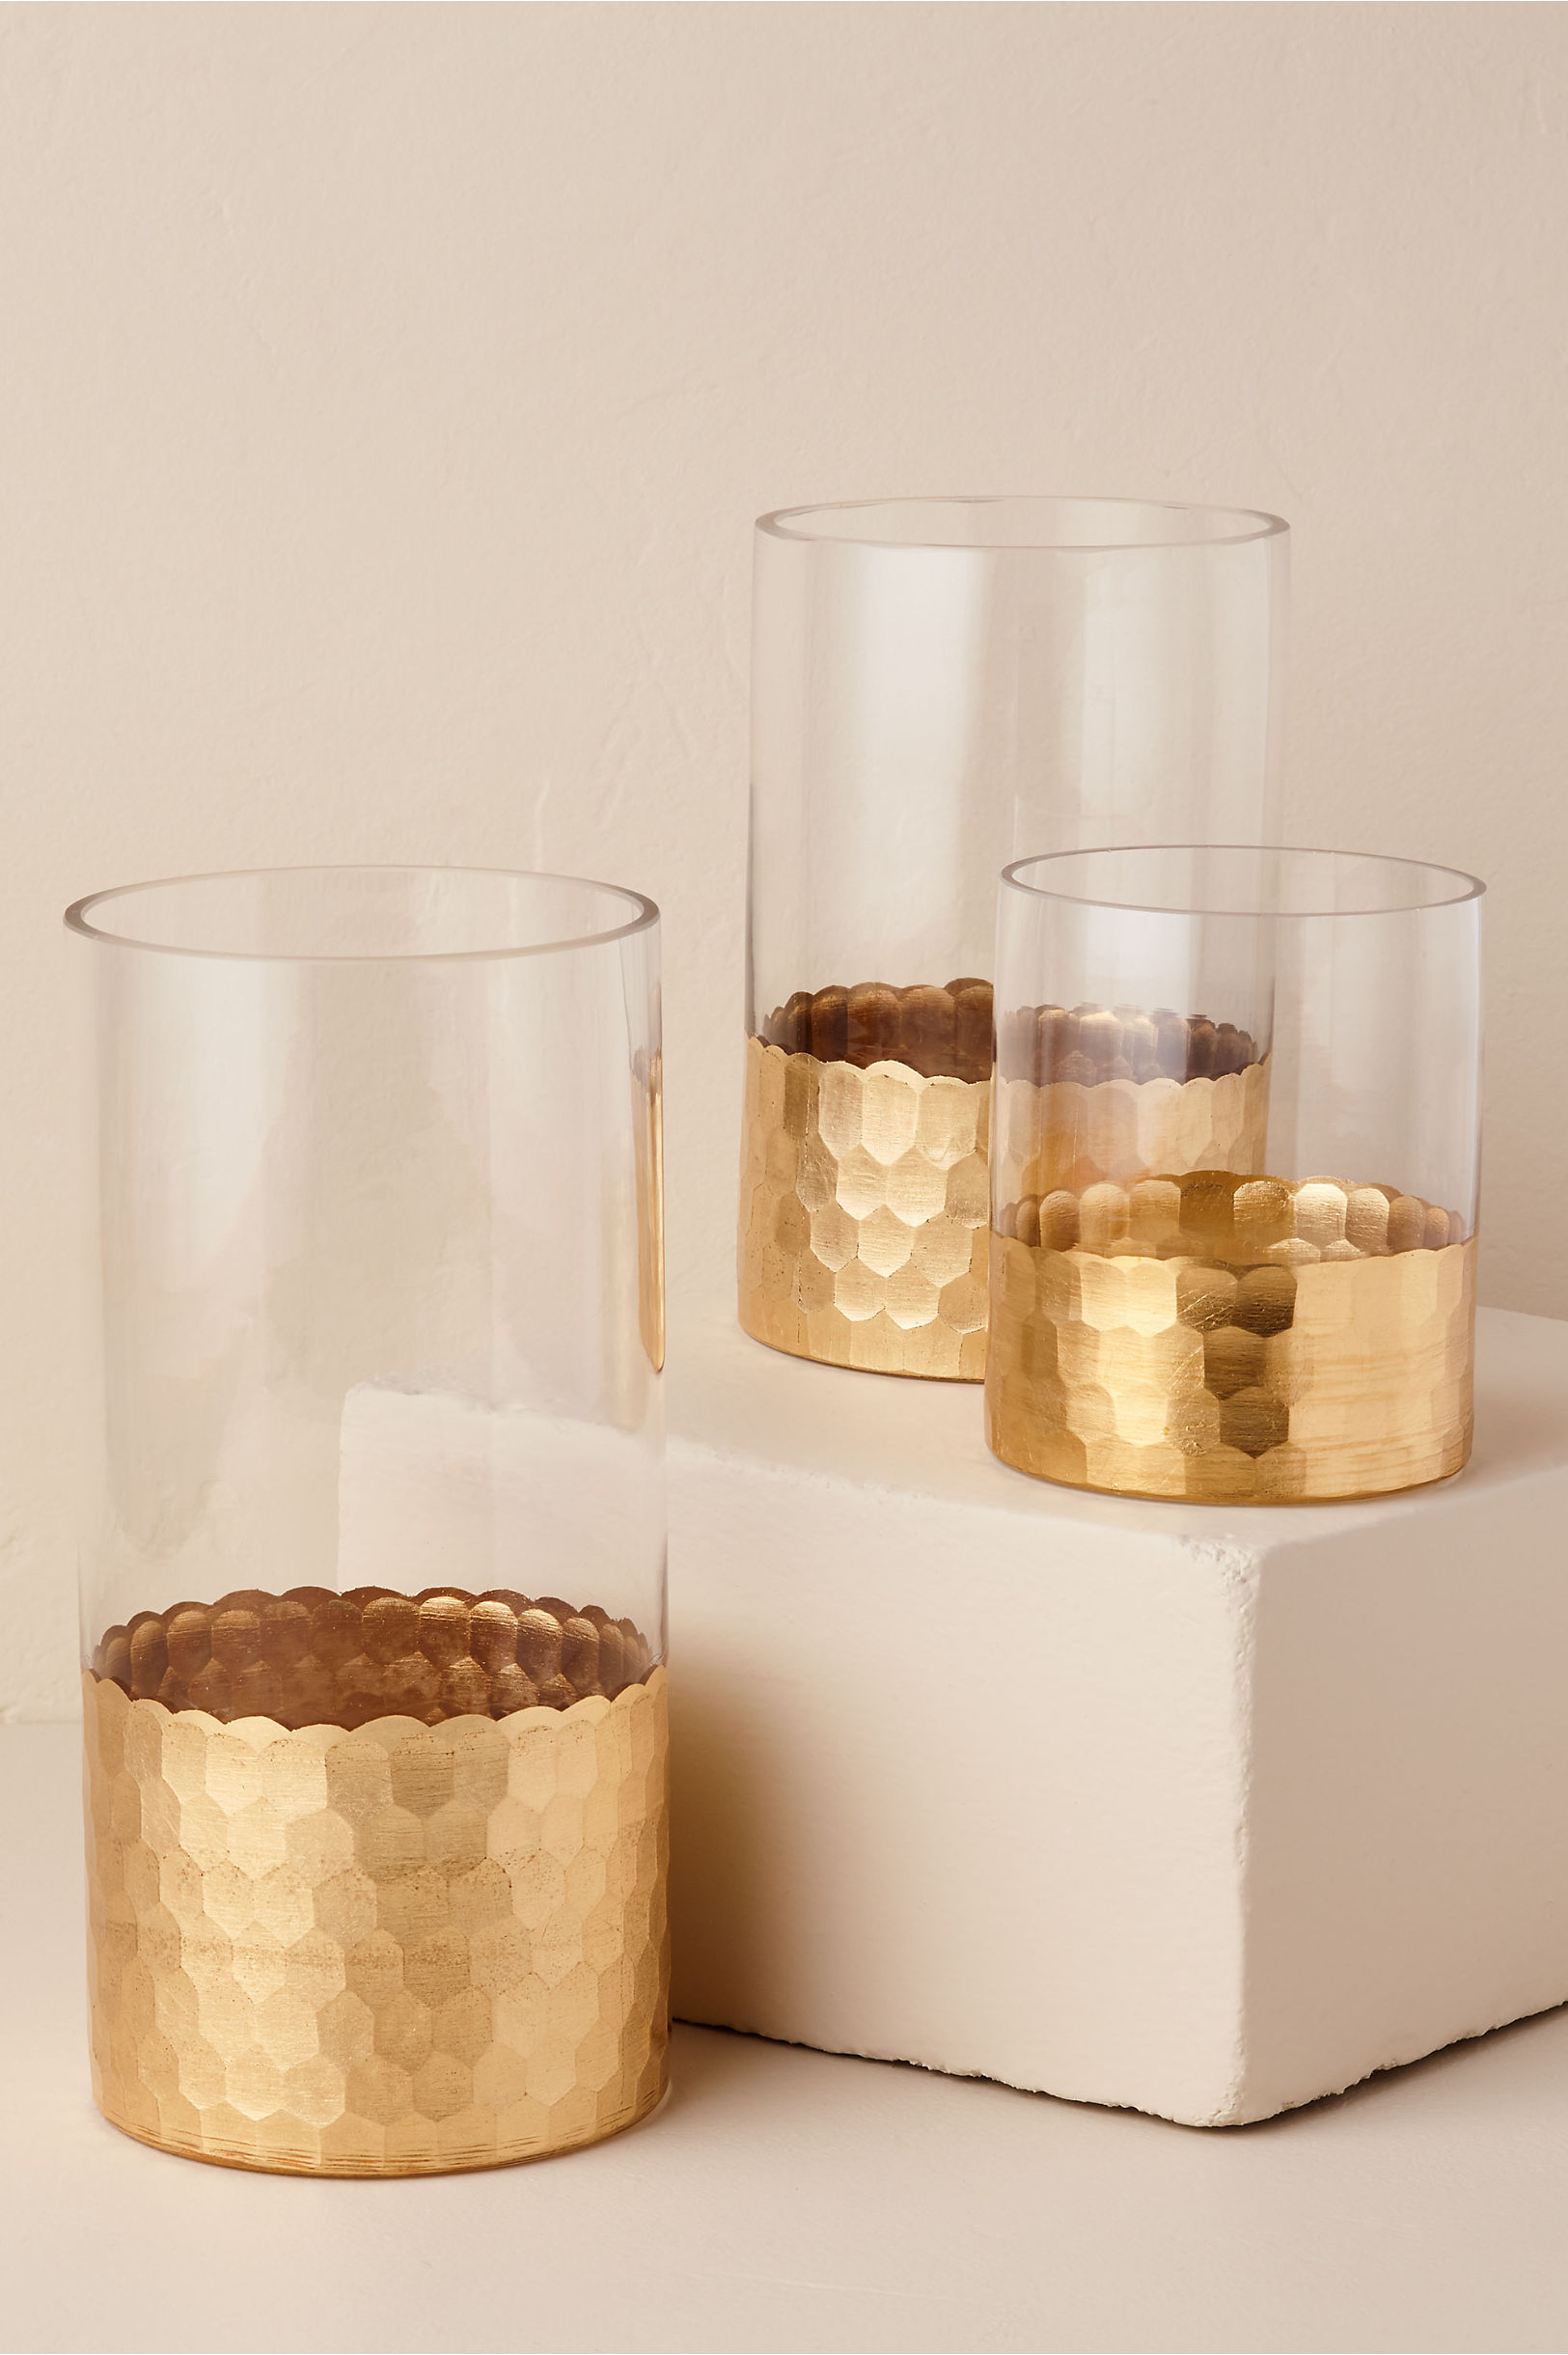 Dipped gold vase gold in dcor gifts bhldn gold dipped gold vase bhldn reviewsmspy